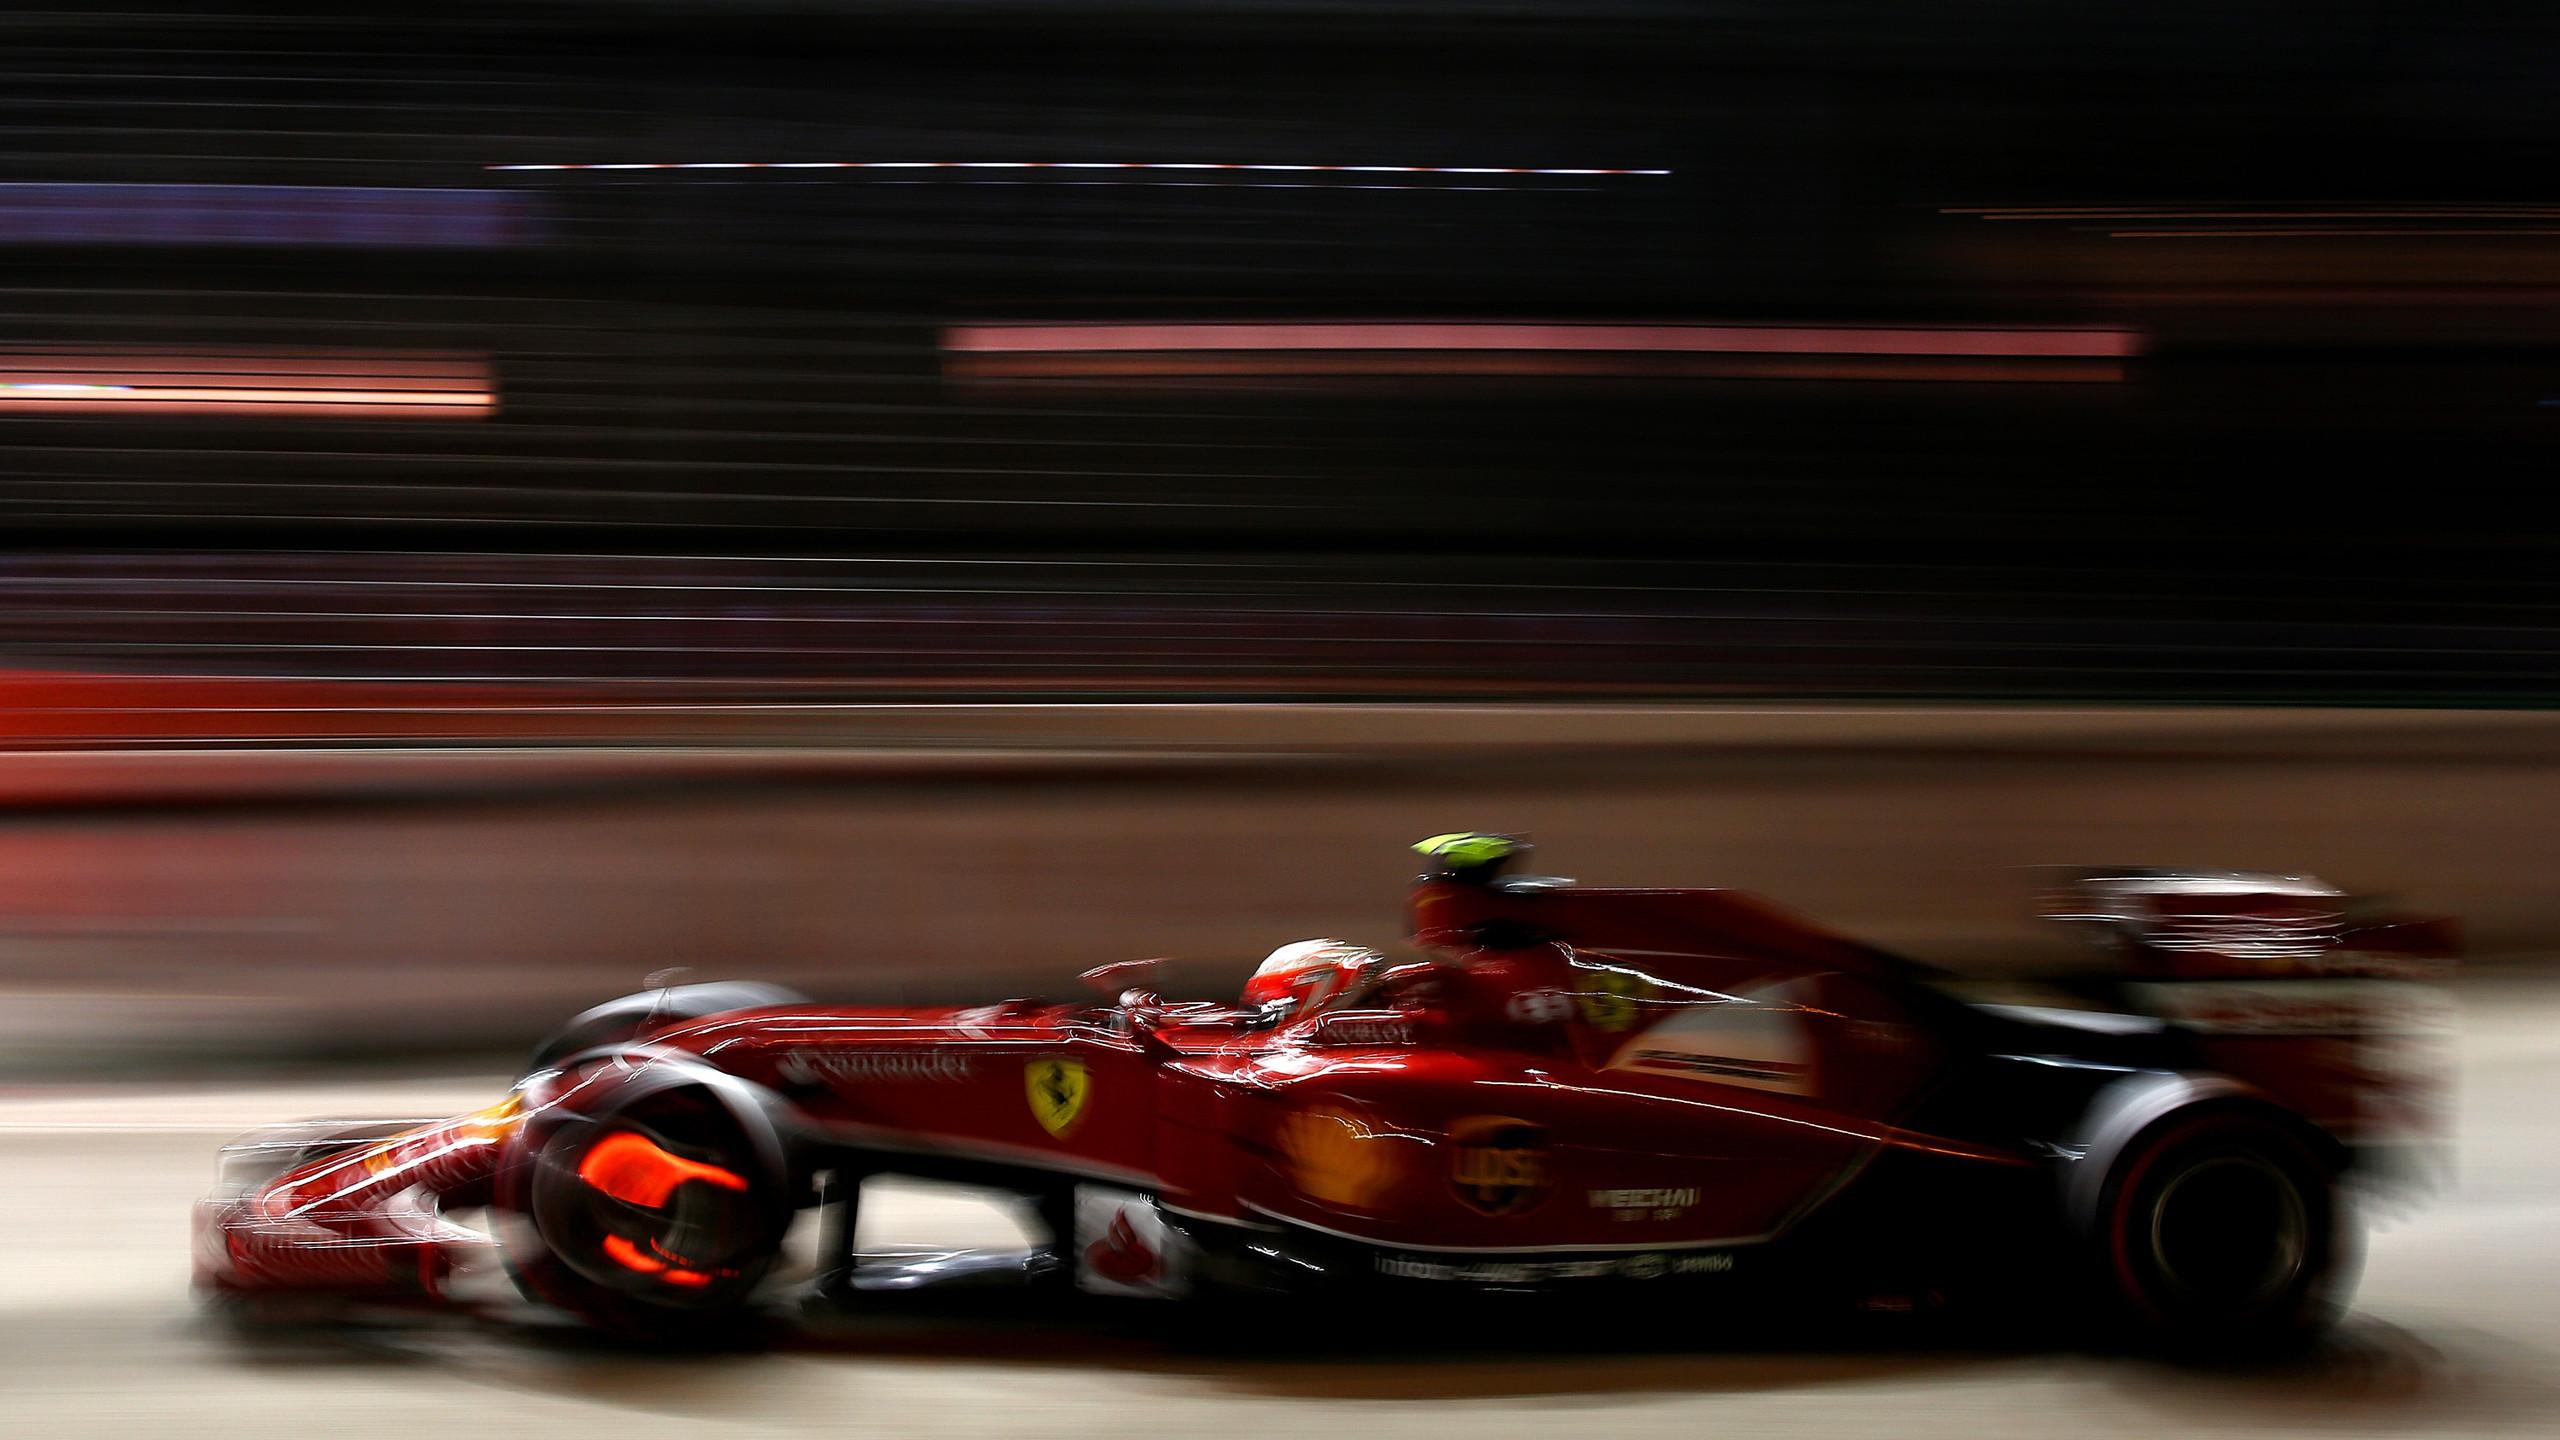 BOTPOST [BOT] 2014 Singapore GP   Kimi Raikkonen Ferrari iimgur 2560x1440